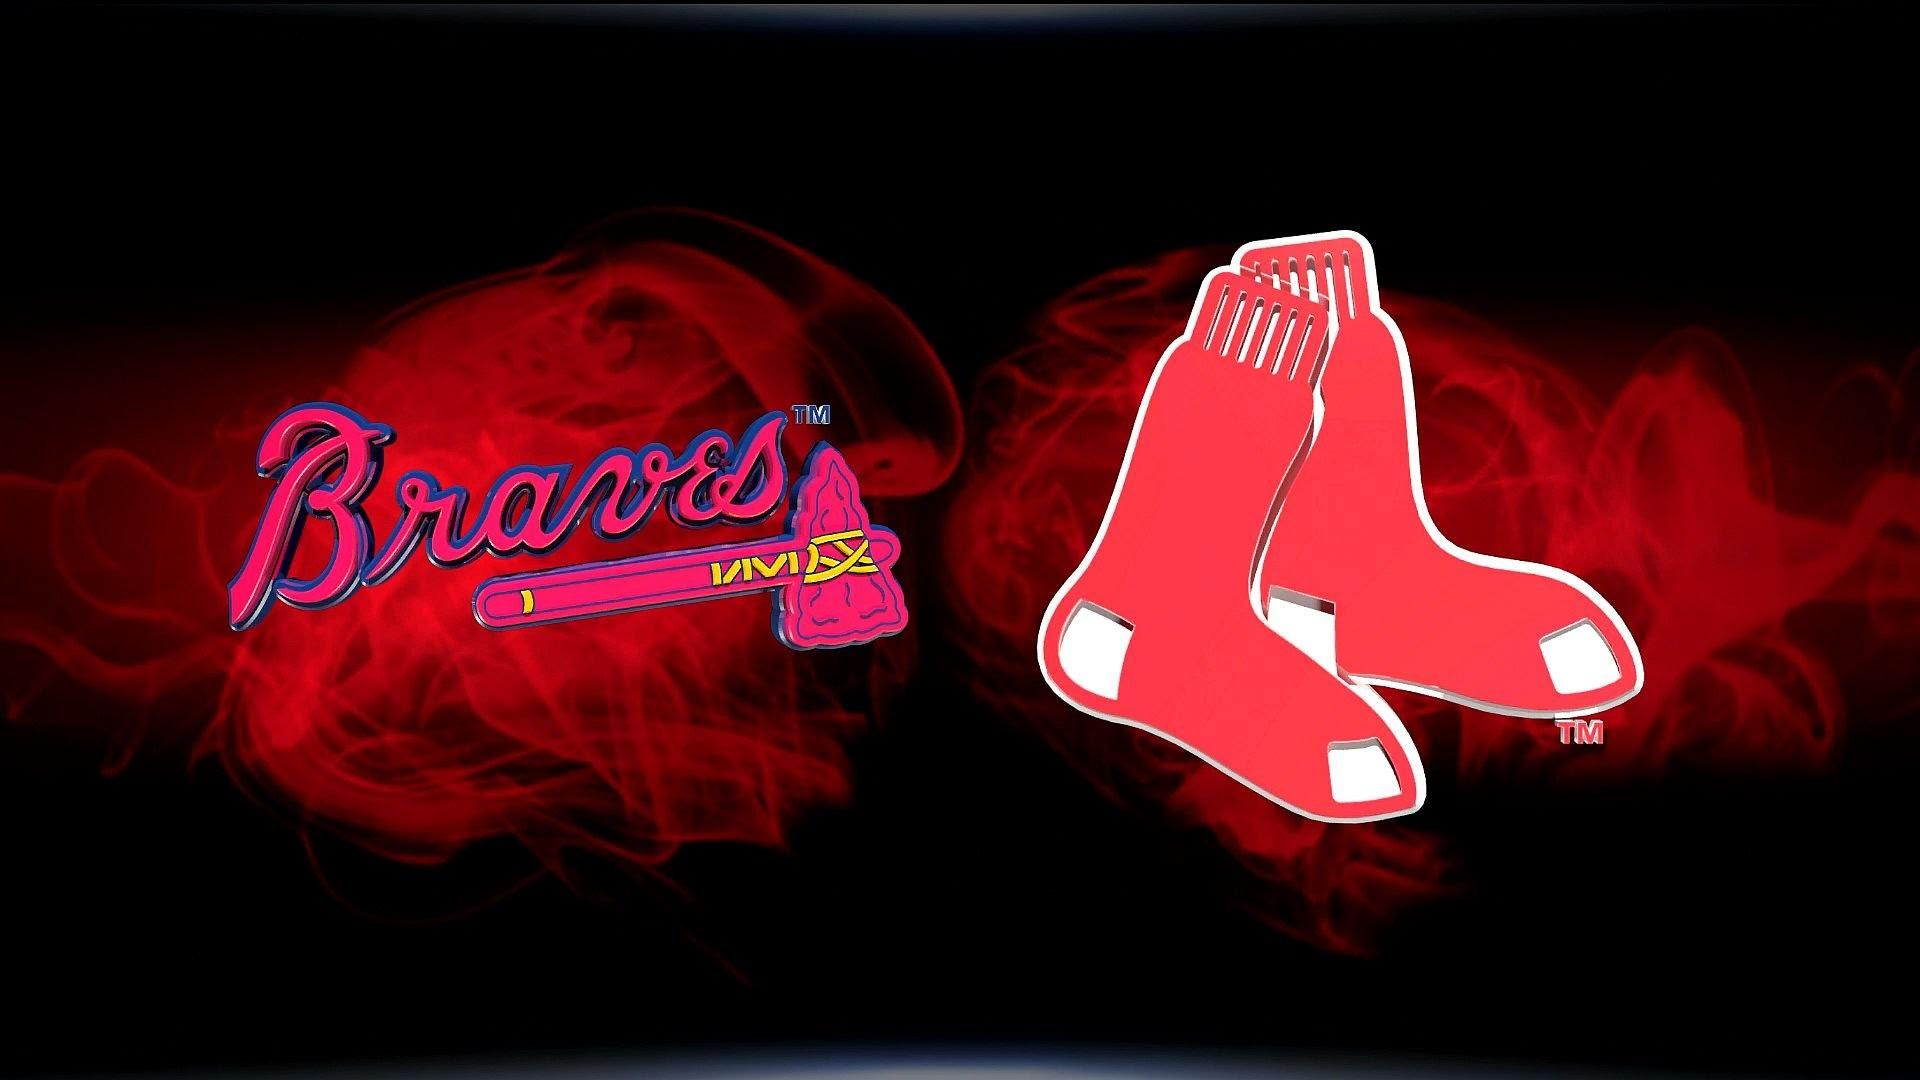 PS4: MLB: The Show 15 – Atlanta Braves vs. Boston Red Sox [1080p 60 FPS] –  YouTube